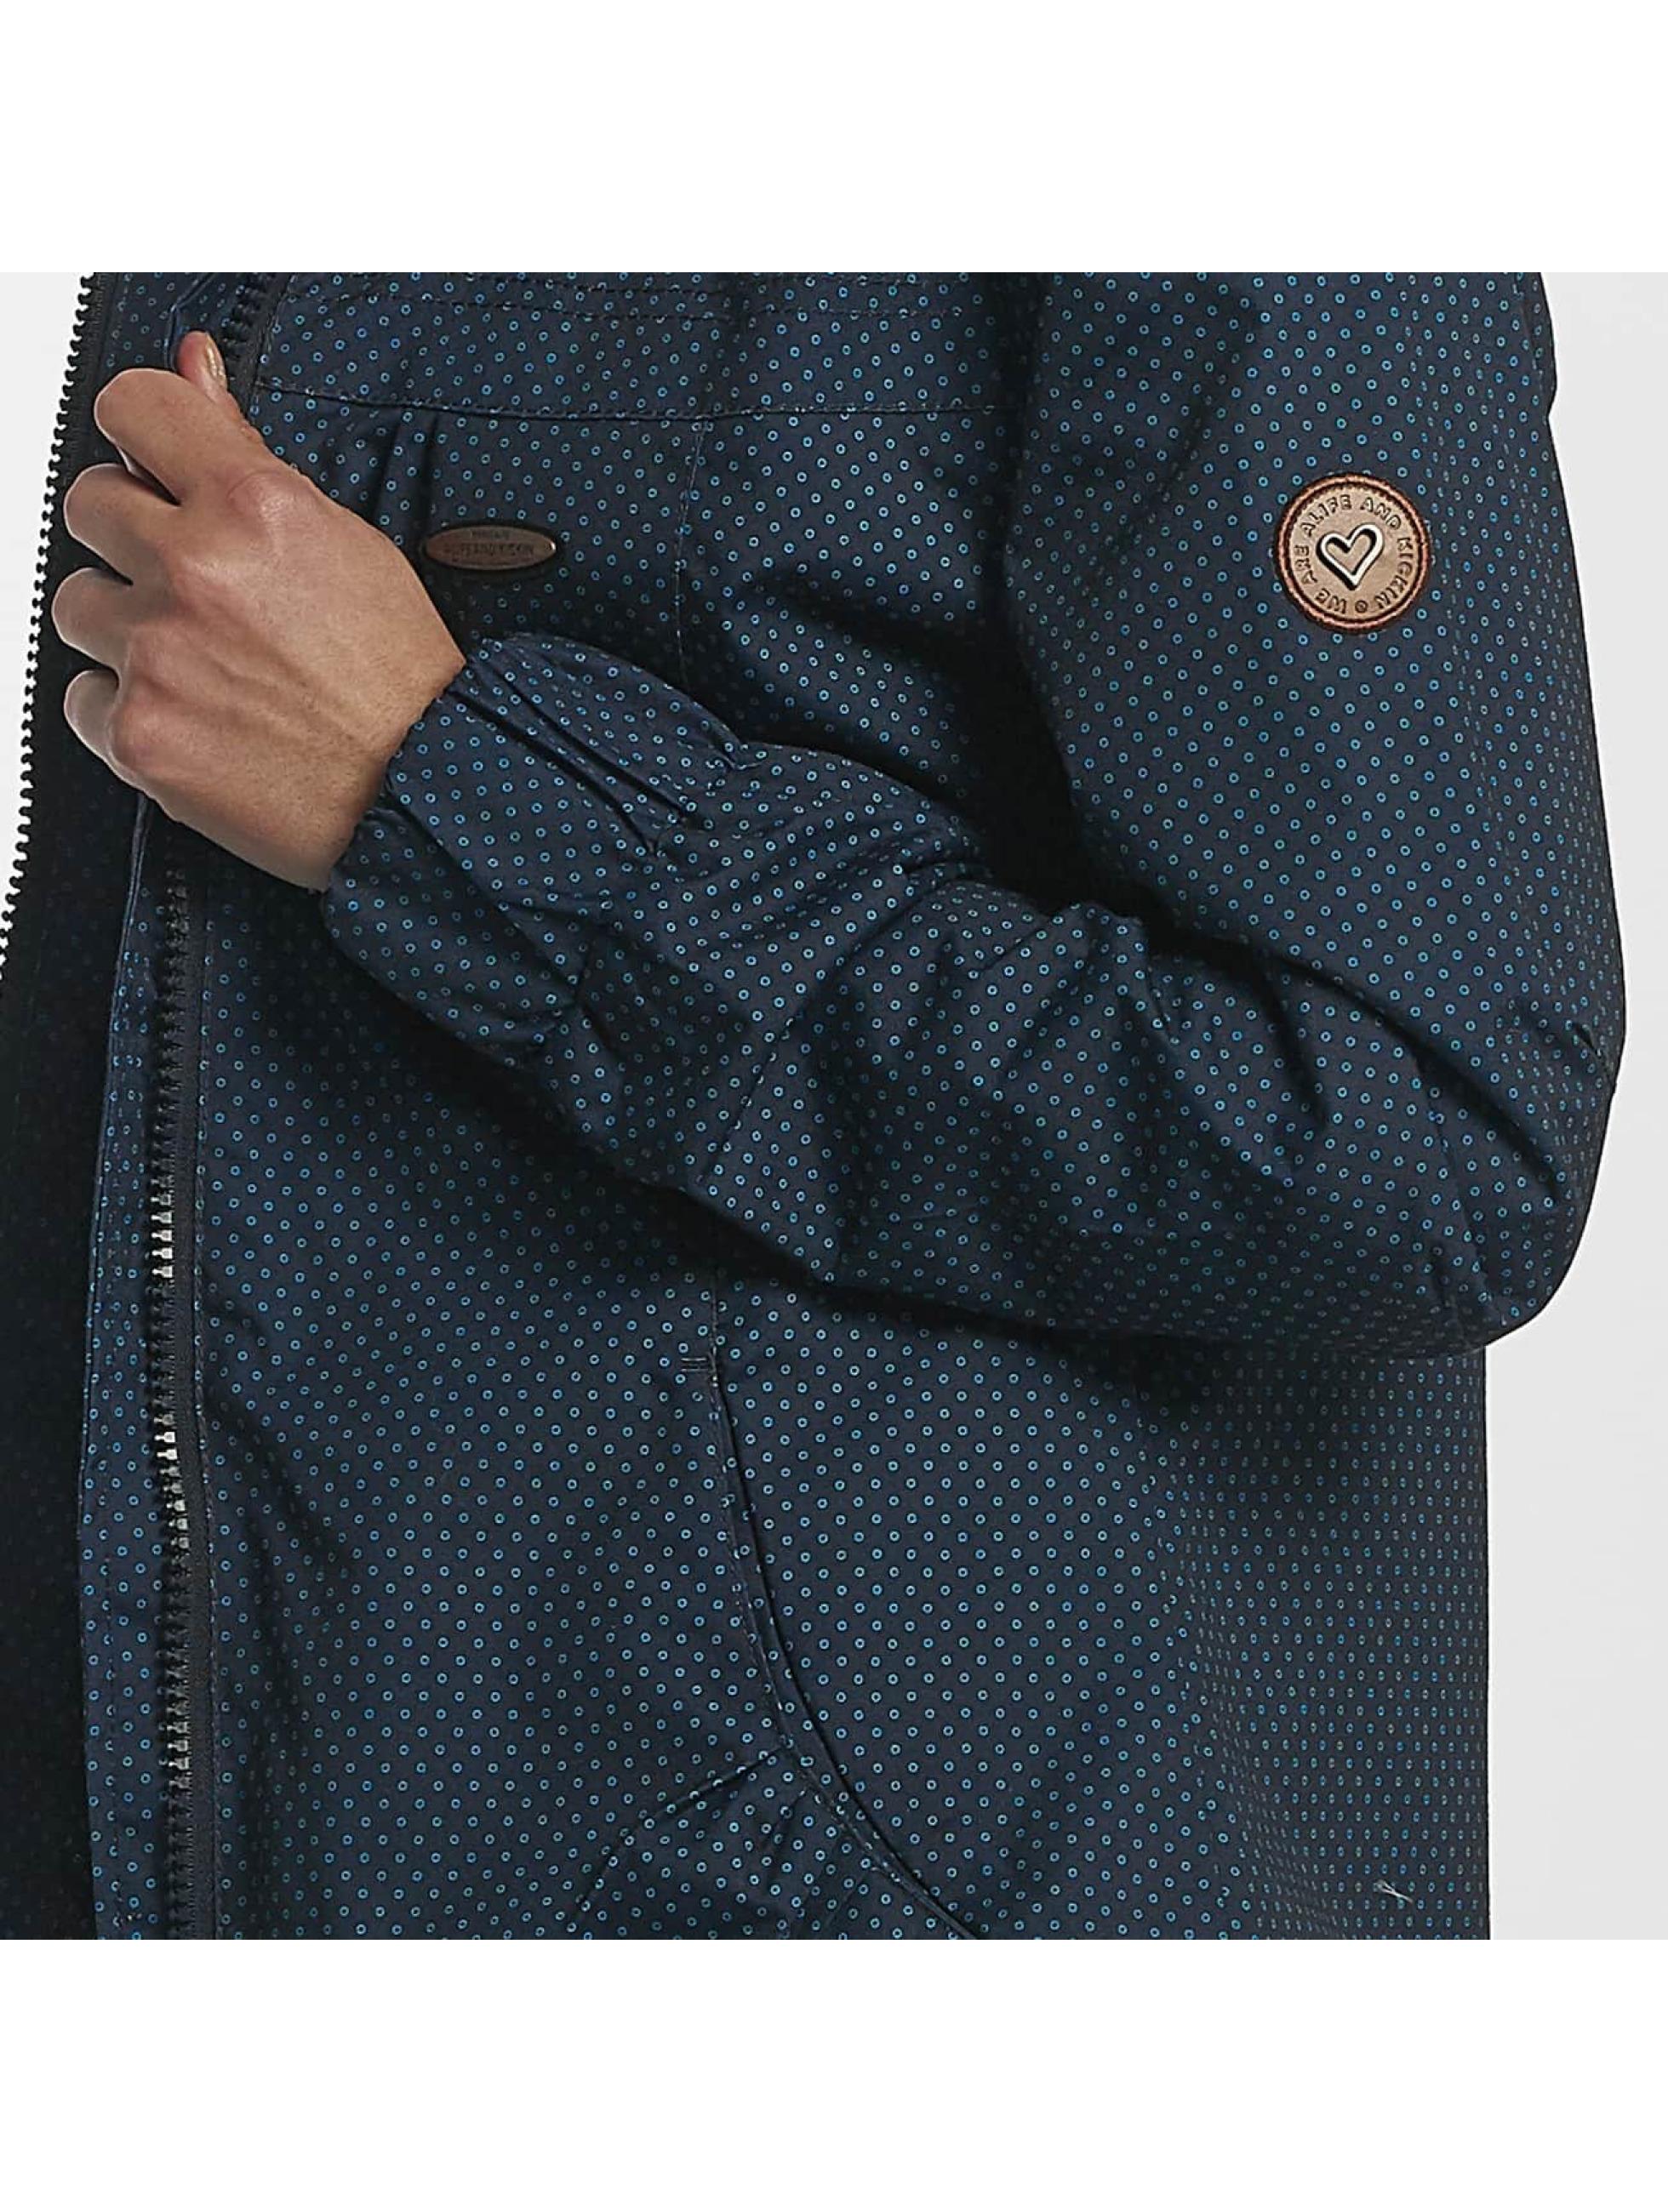 Alife & Kickin Transitional Jackets Black Mamba A blå